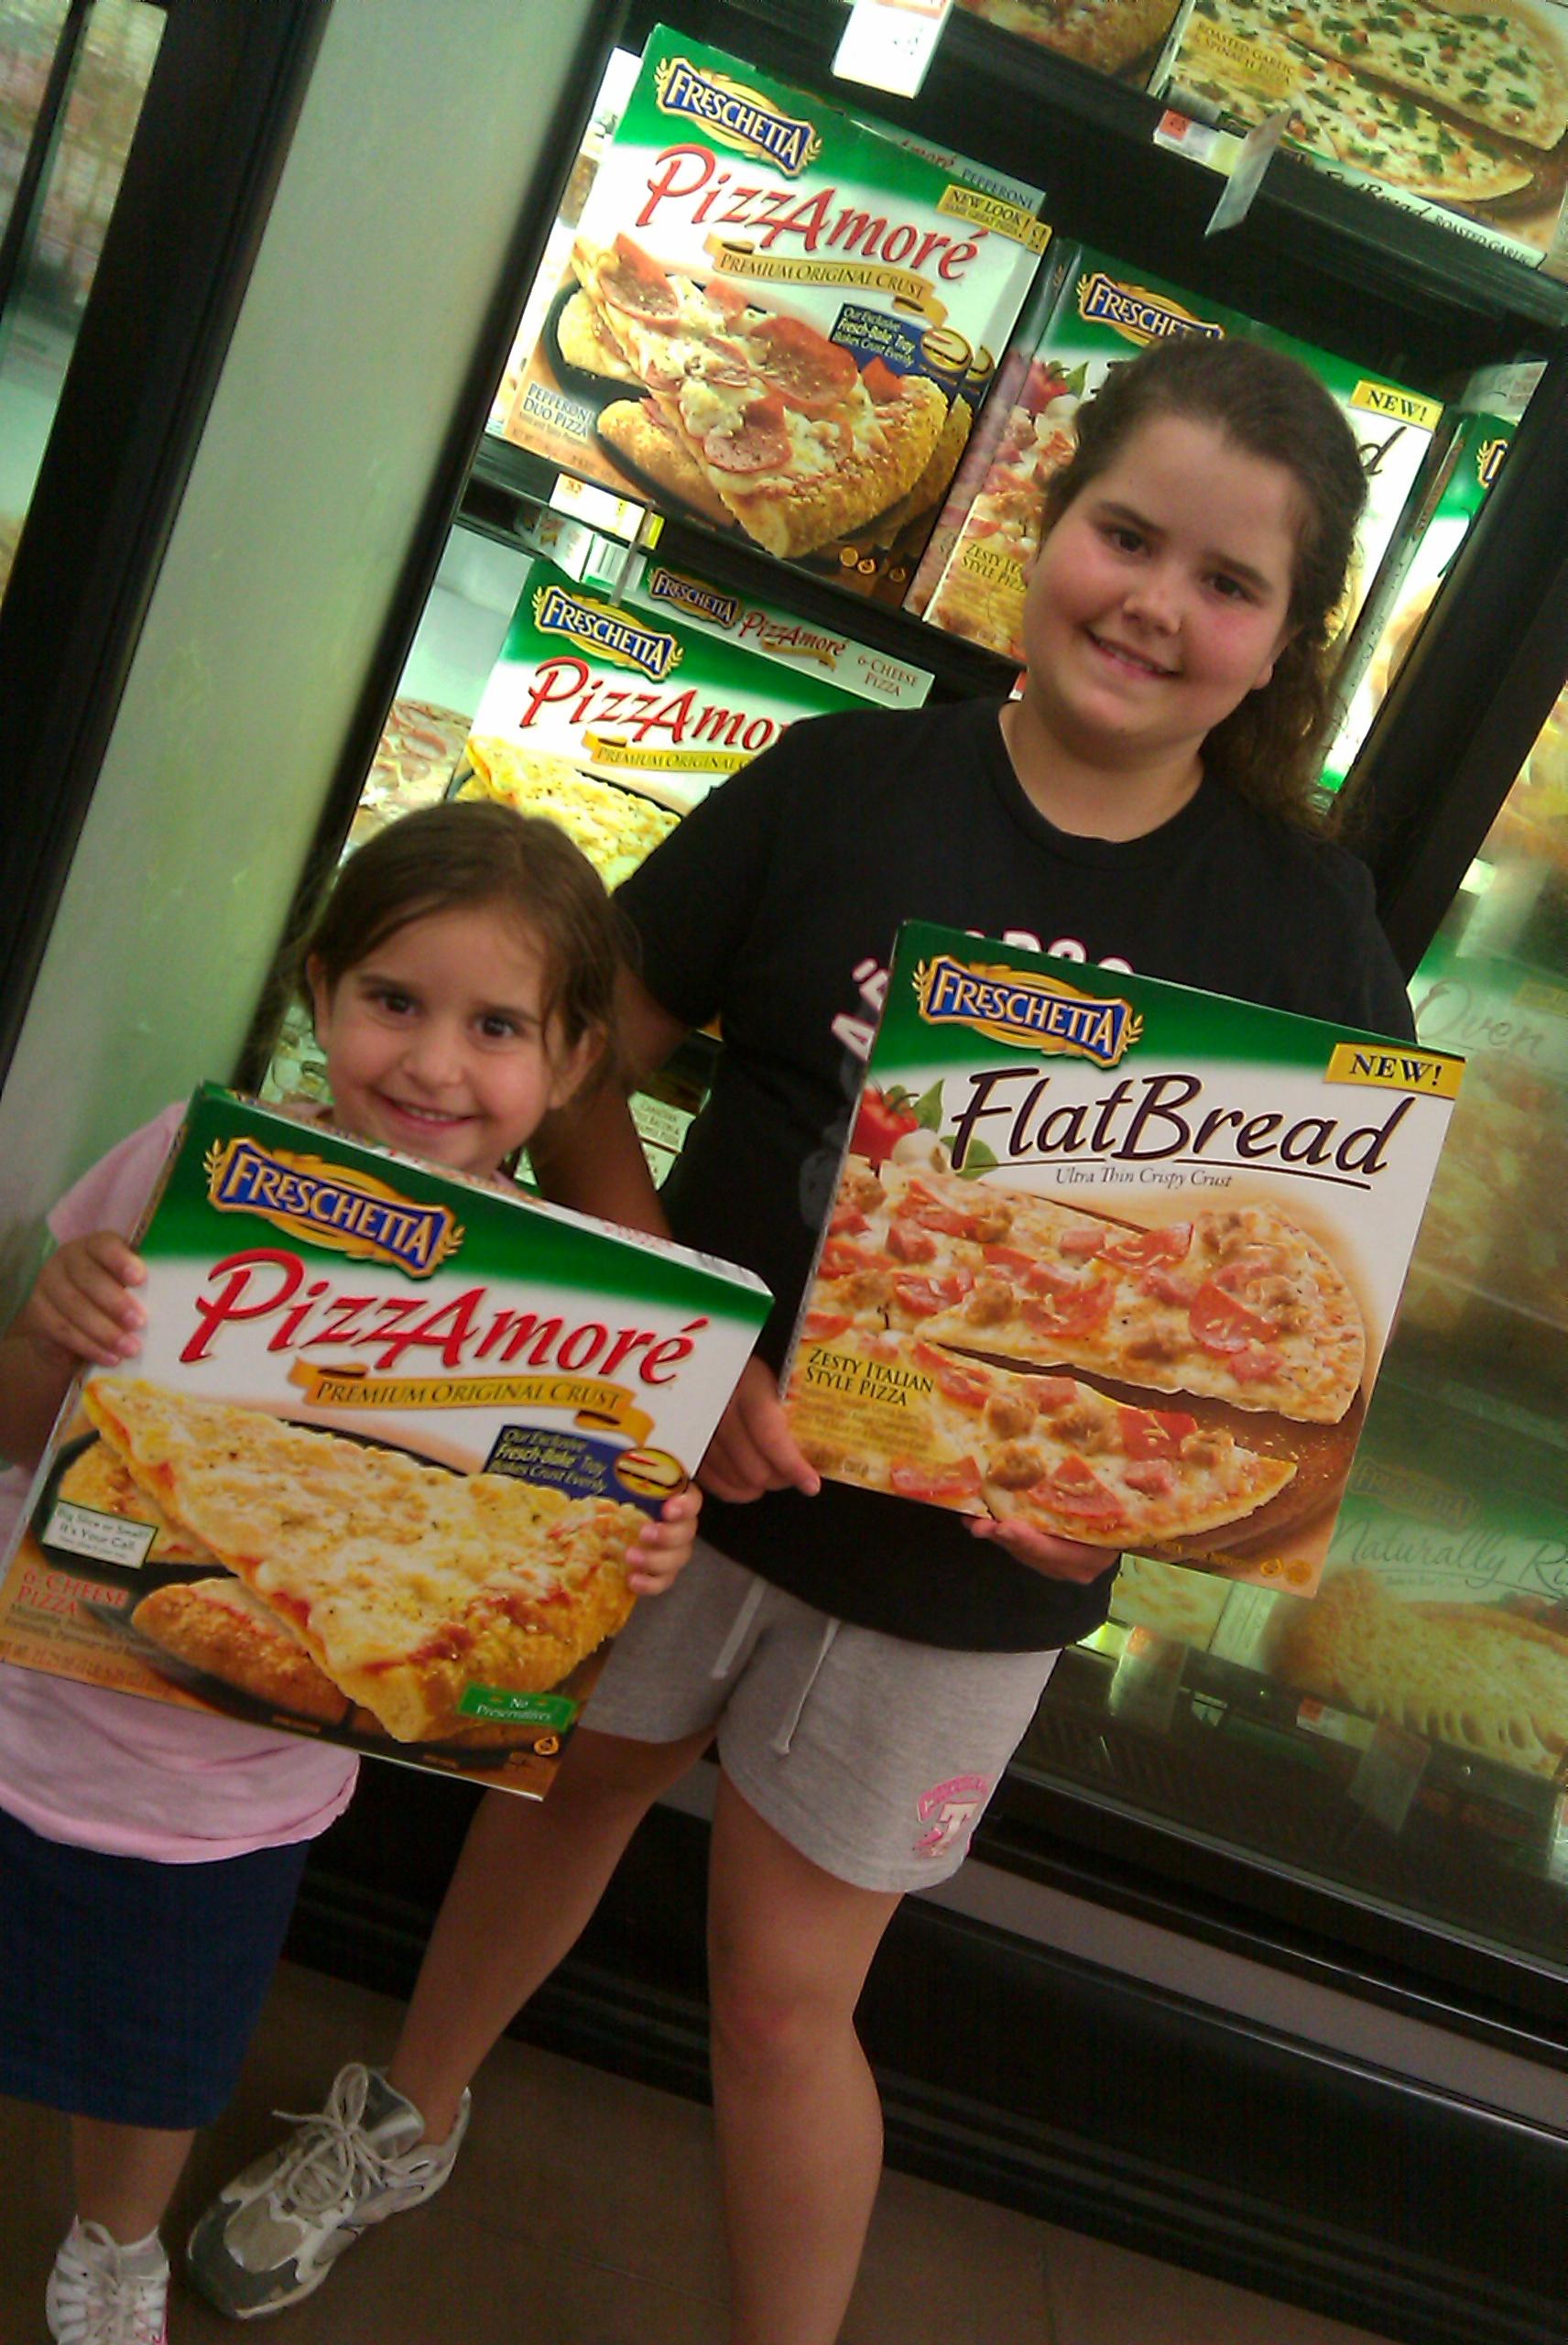 Freschetta Flatbread Pizza photograph with girls